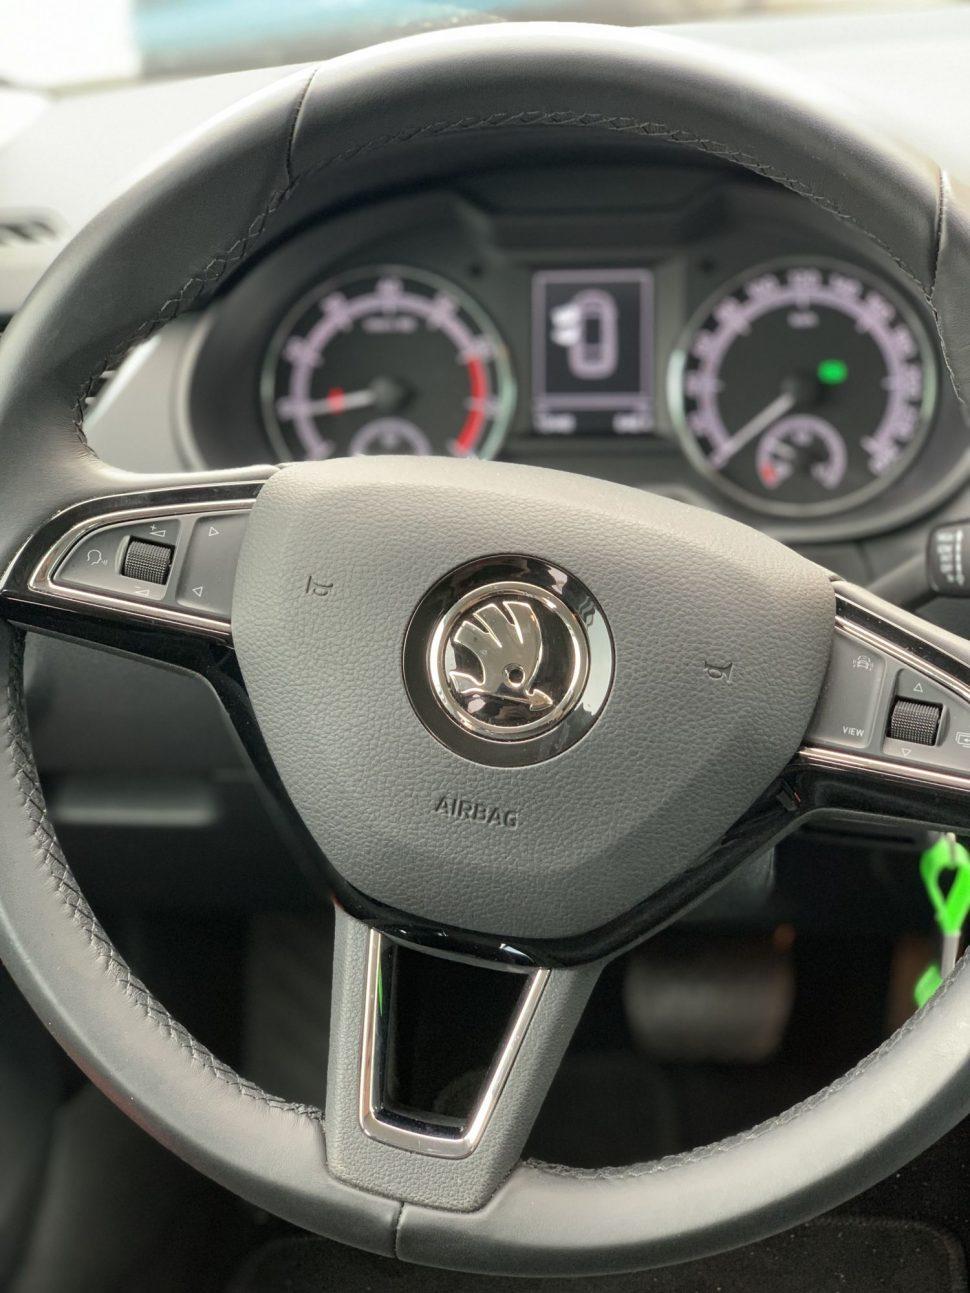 autopožičovňa deak cars bratislava požičanie áut